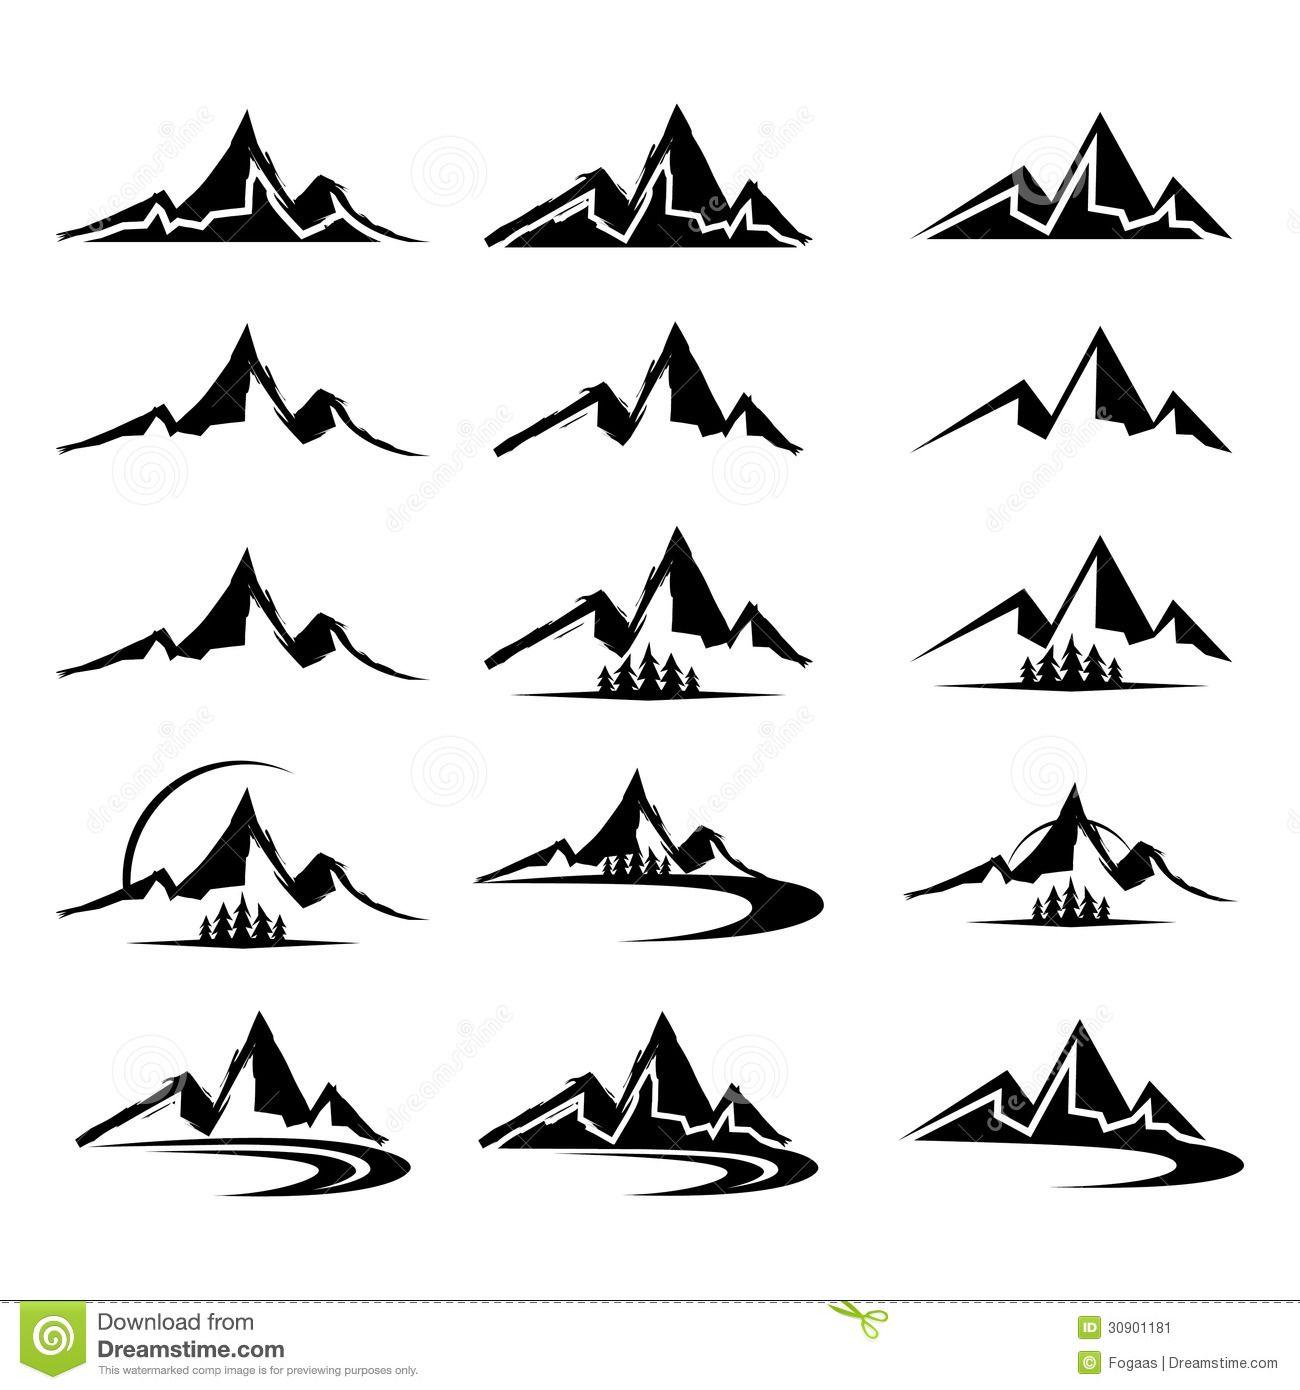 mountain silhouette Google Search Clip art, Custom